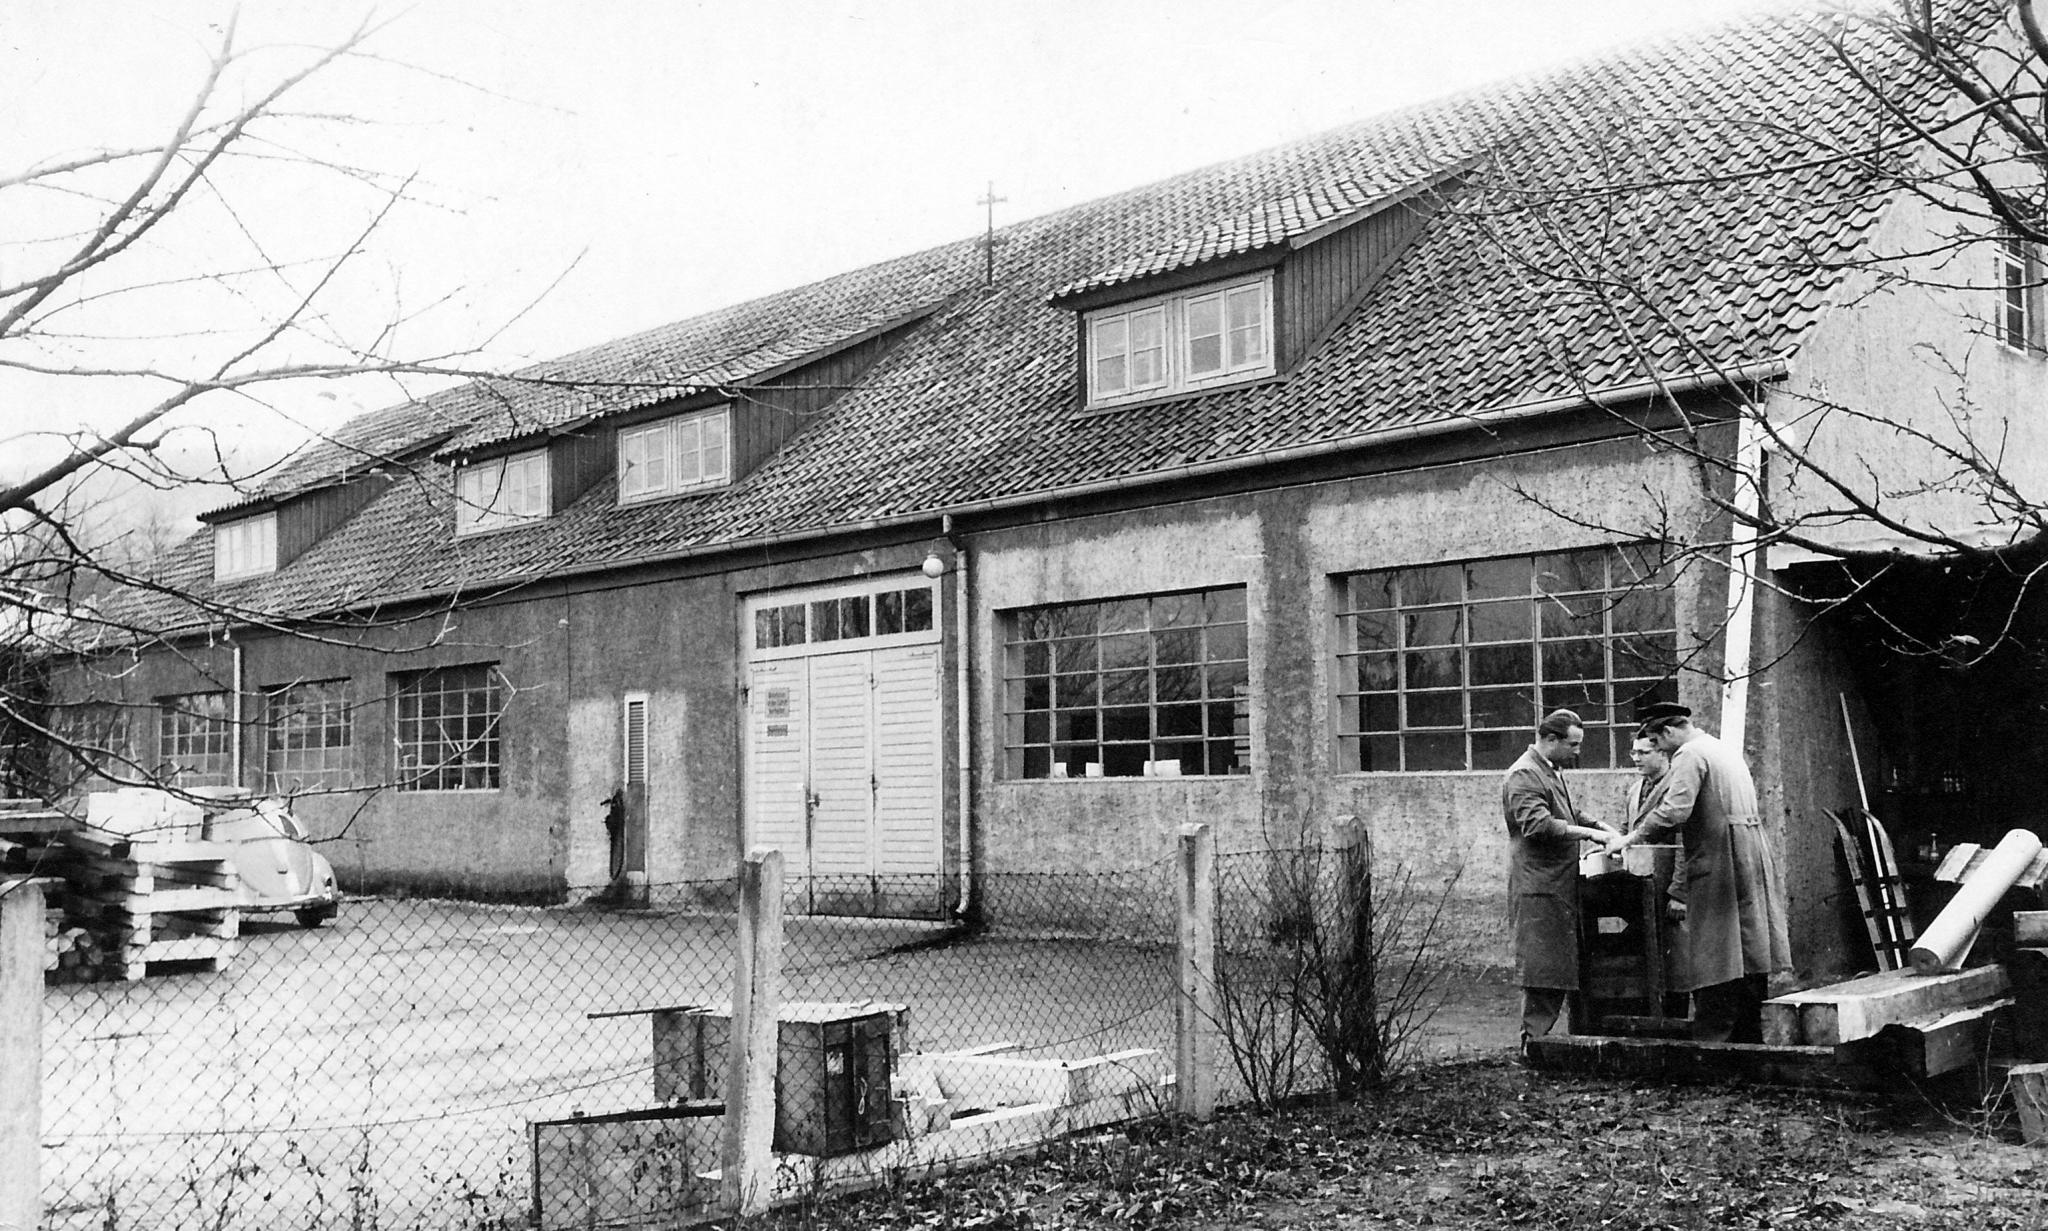 Funke1950er-01-Modell-undFormenbau-HannoverscheStr